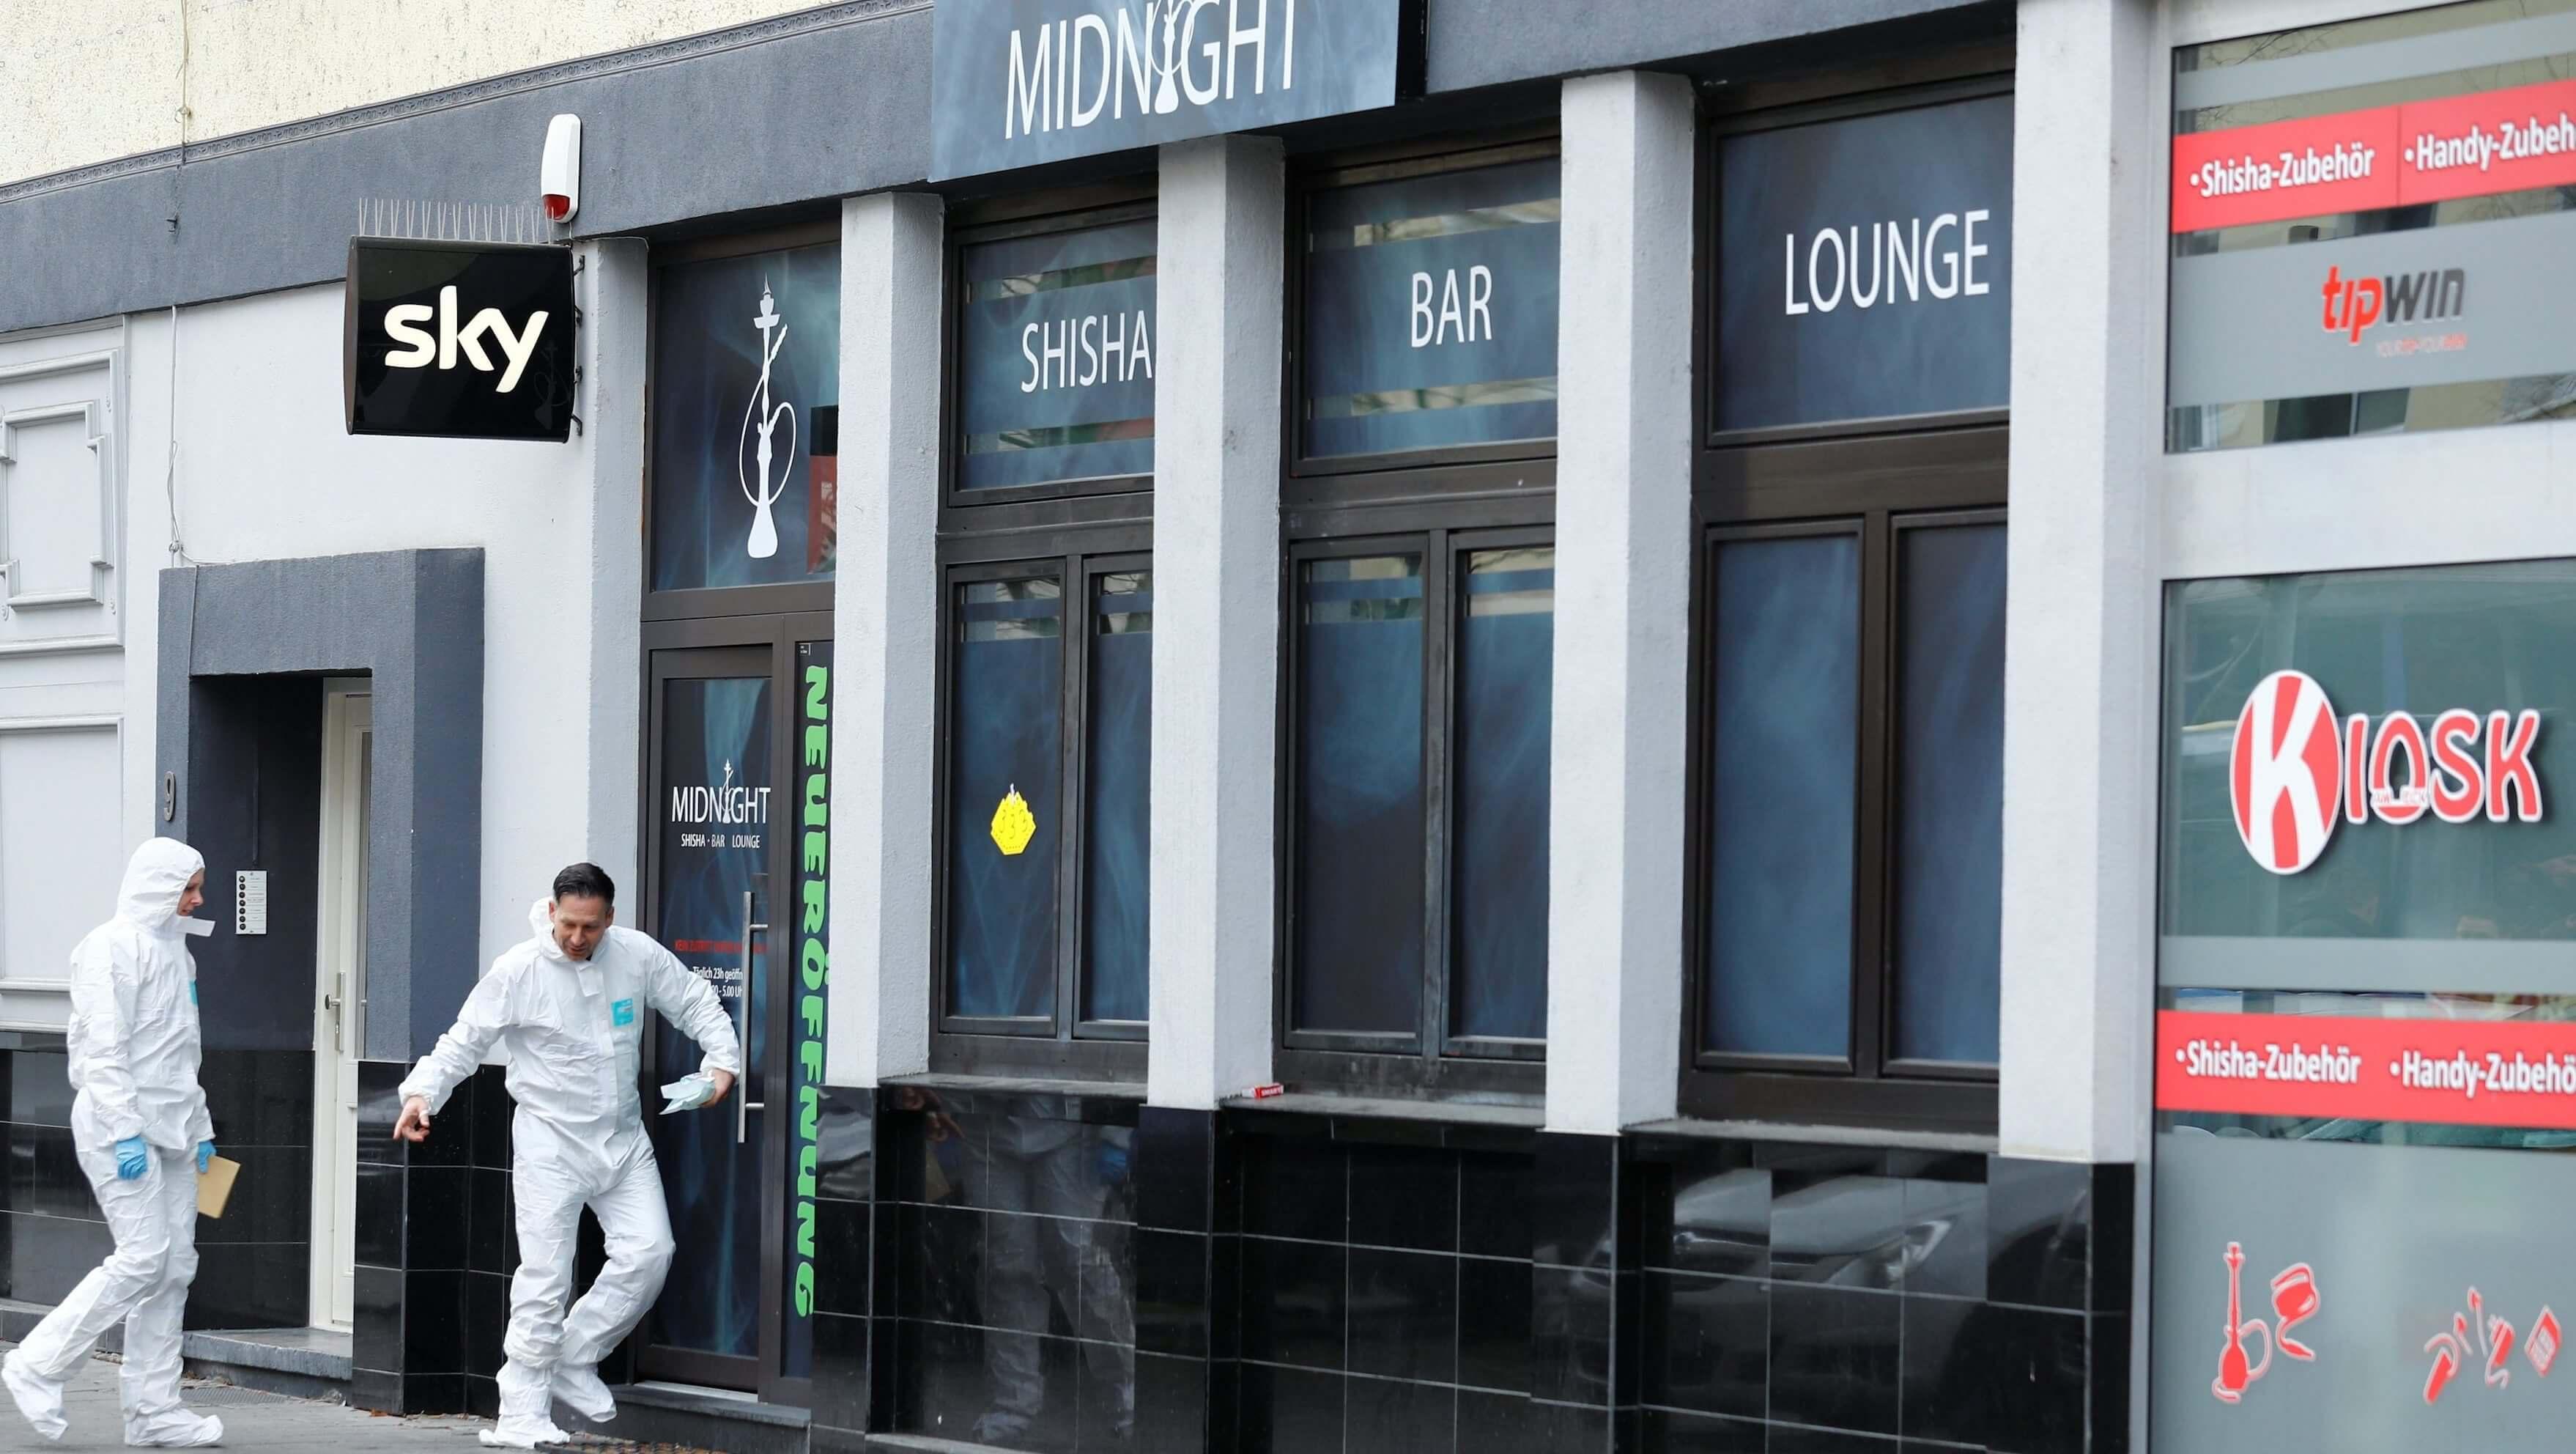 Forensic investigators enter the Midnight Shisha bar after a shooting in Hanau